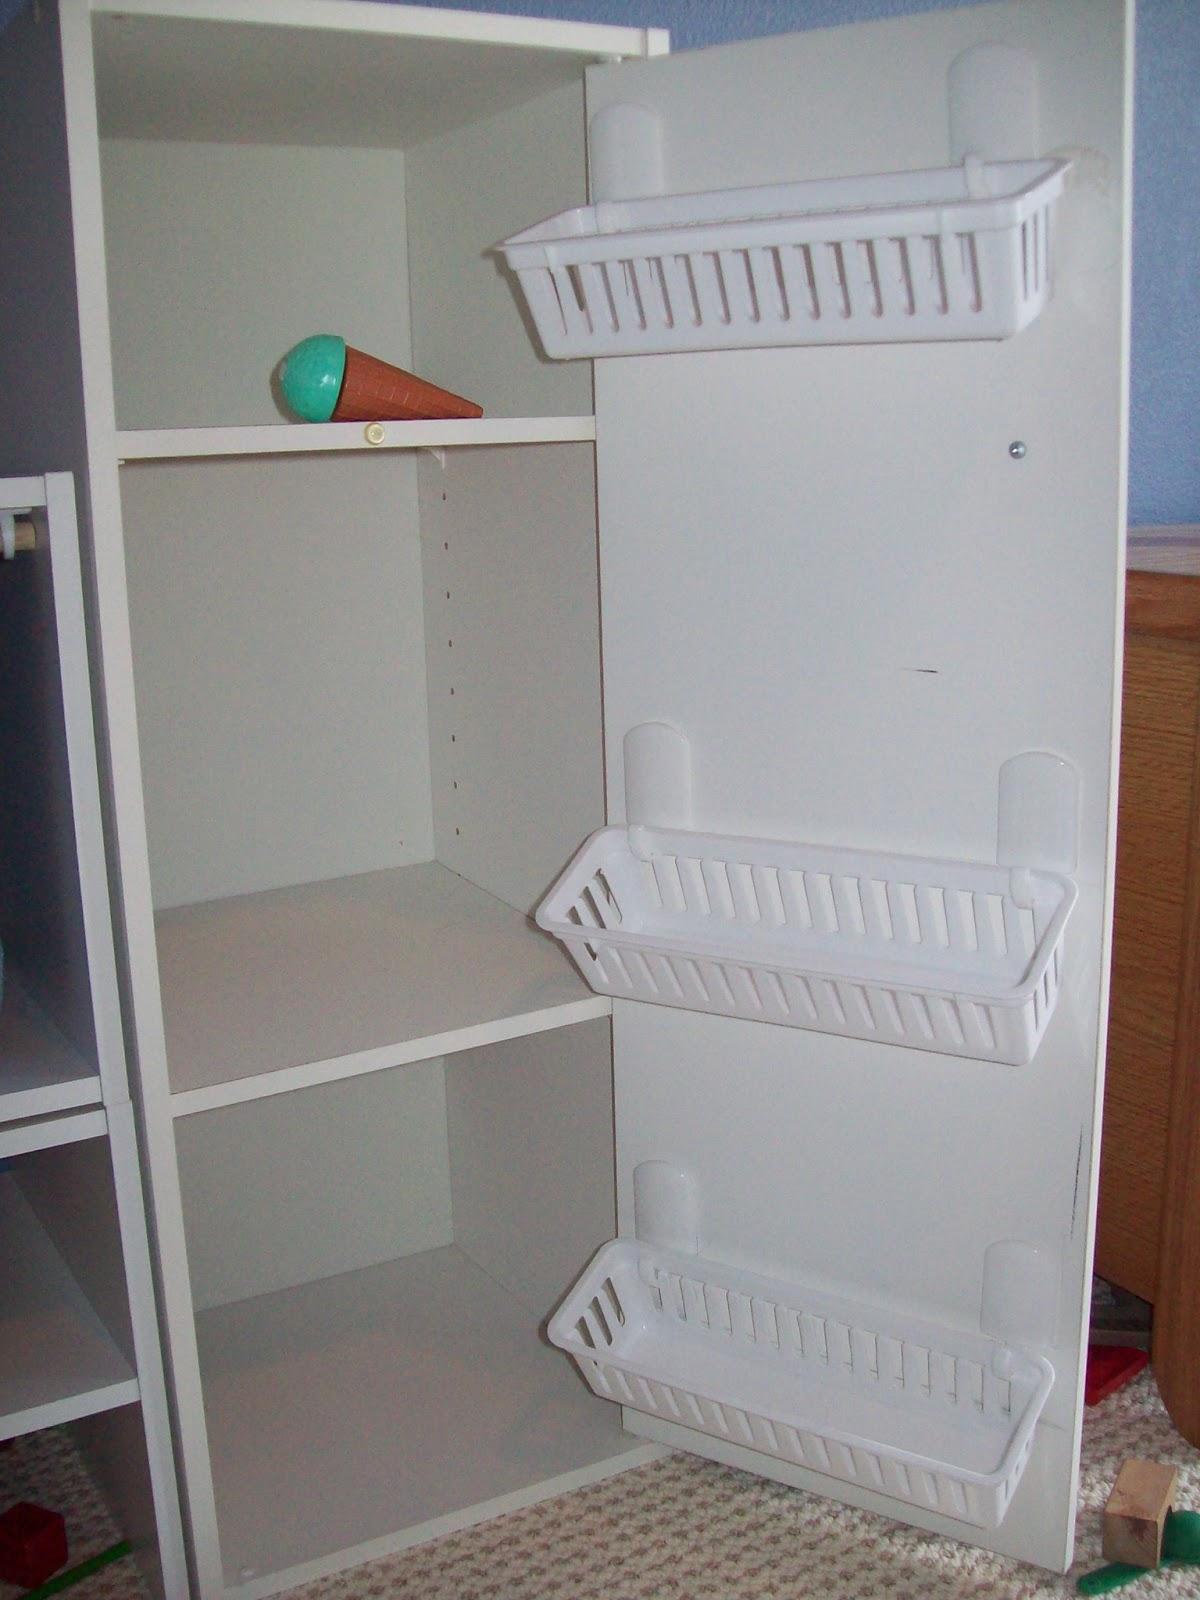 Homemade Play Kitchen Sceleratus Classical Academy Homemade Play Kitchen The Refrigerator